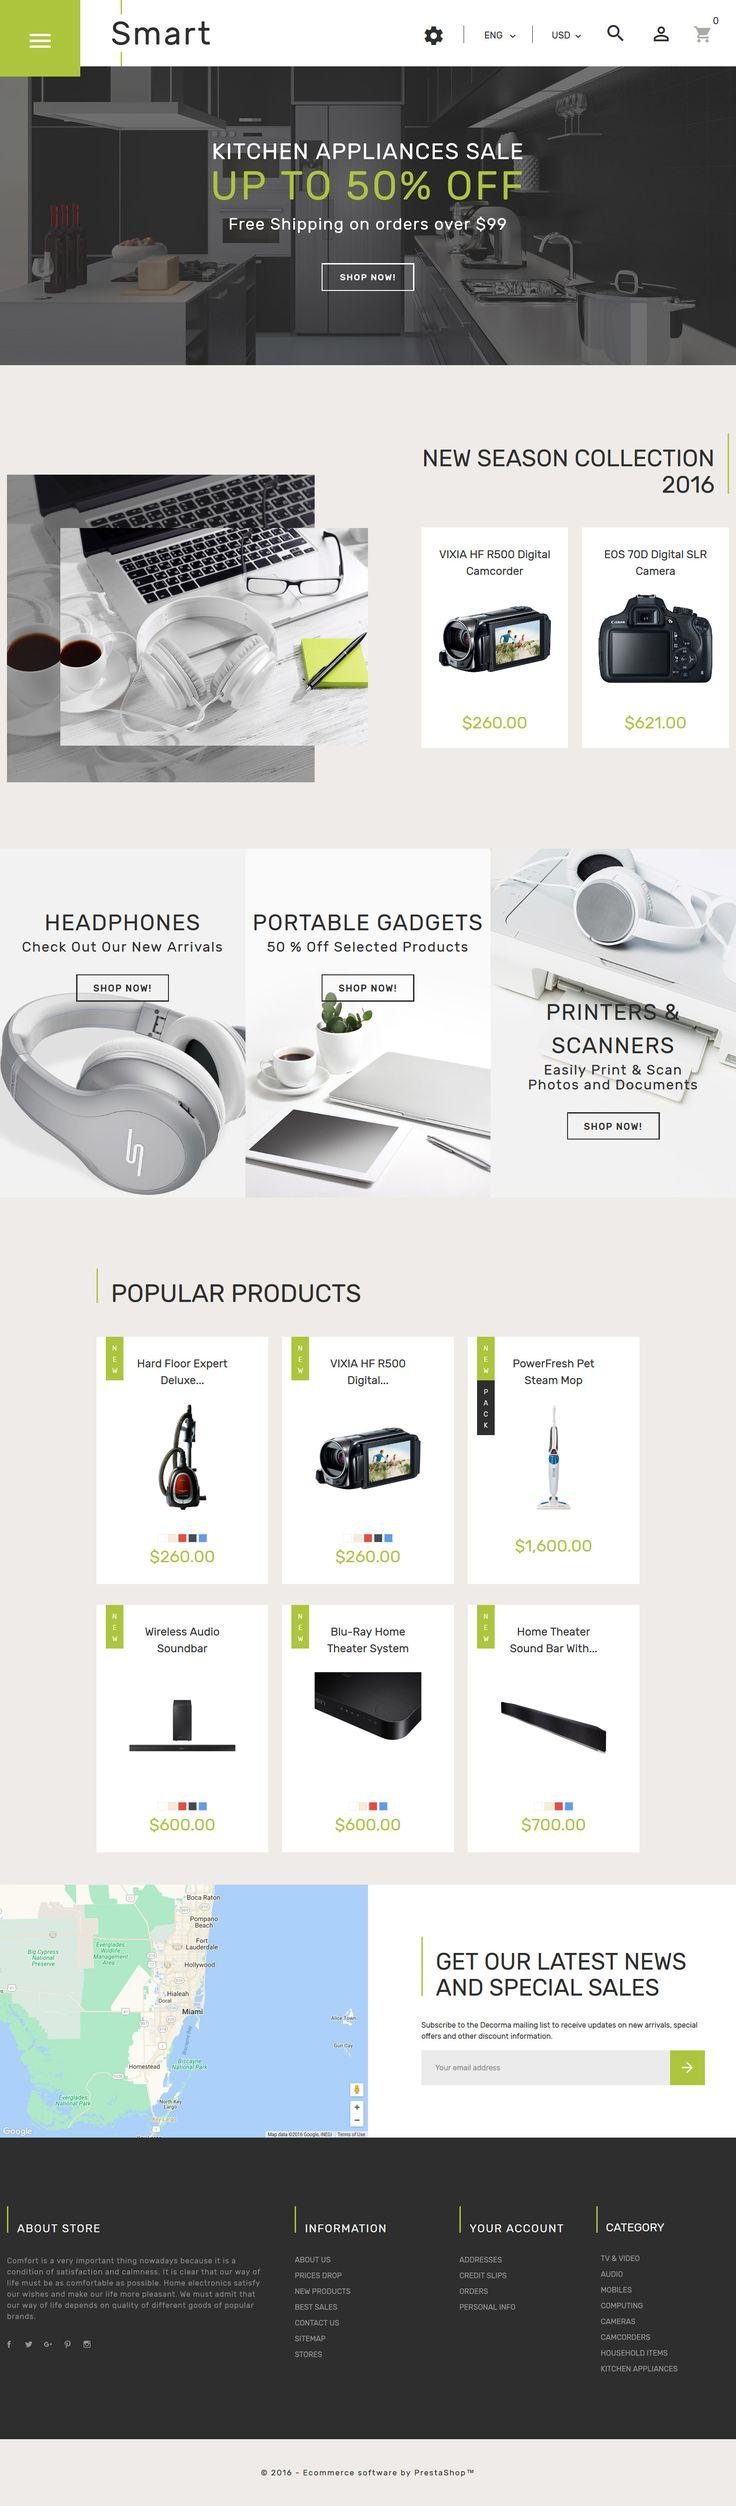 Smart - Gadgets & Electronics PrestaShop Theme - http://www.templatemonster.com/prestashop-themes/smart-gadgets-electronics-prestashop-theme-61360.html